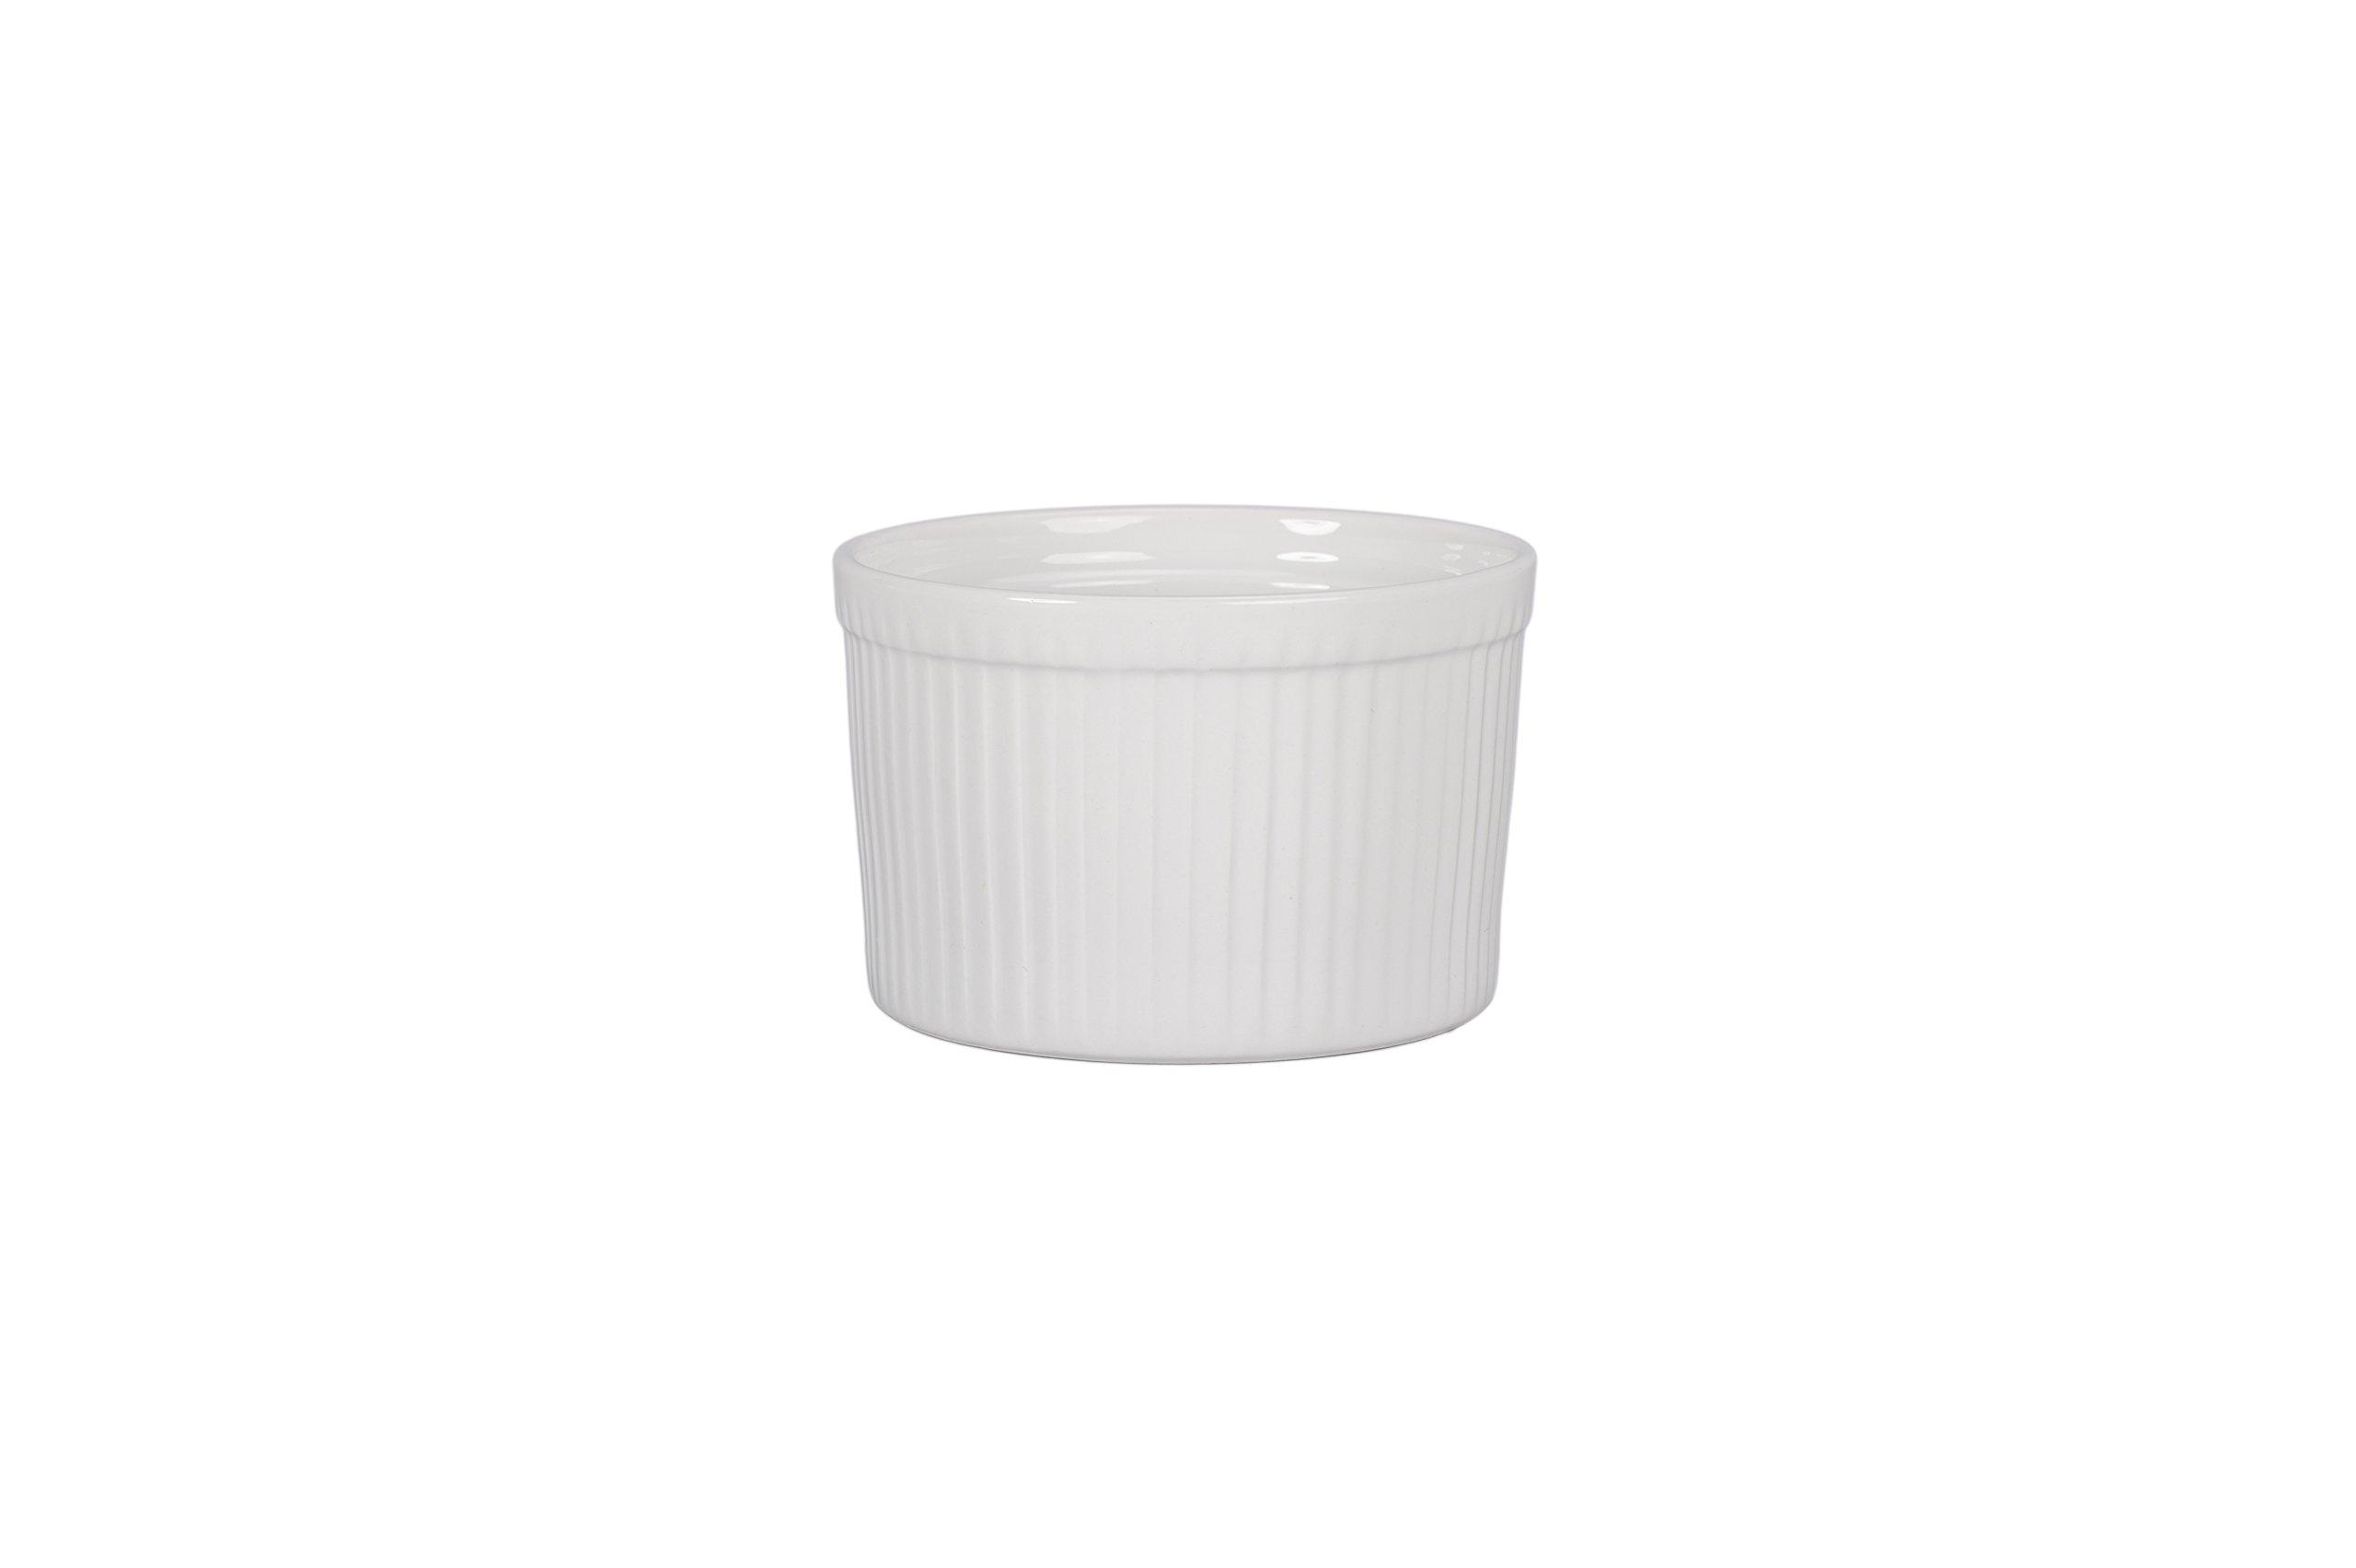 BIA Cordon Bleu 900020S4SIOC Classic Bakeware Souffle Dish, White